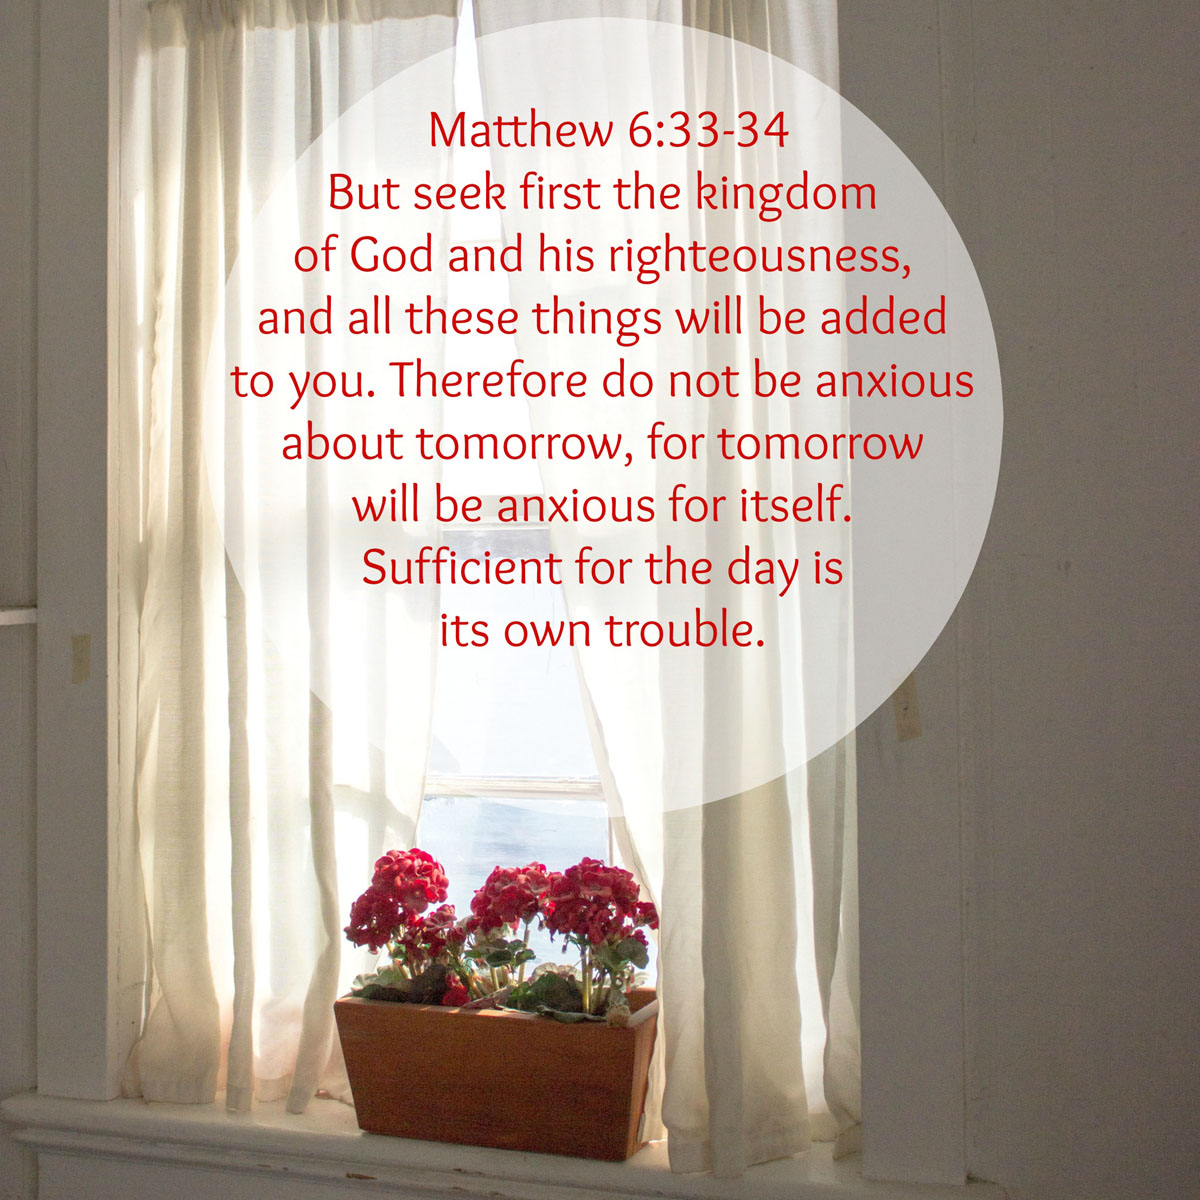 matthew-6-33-34-esv